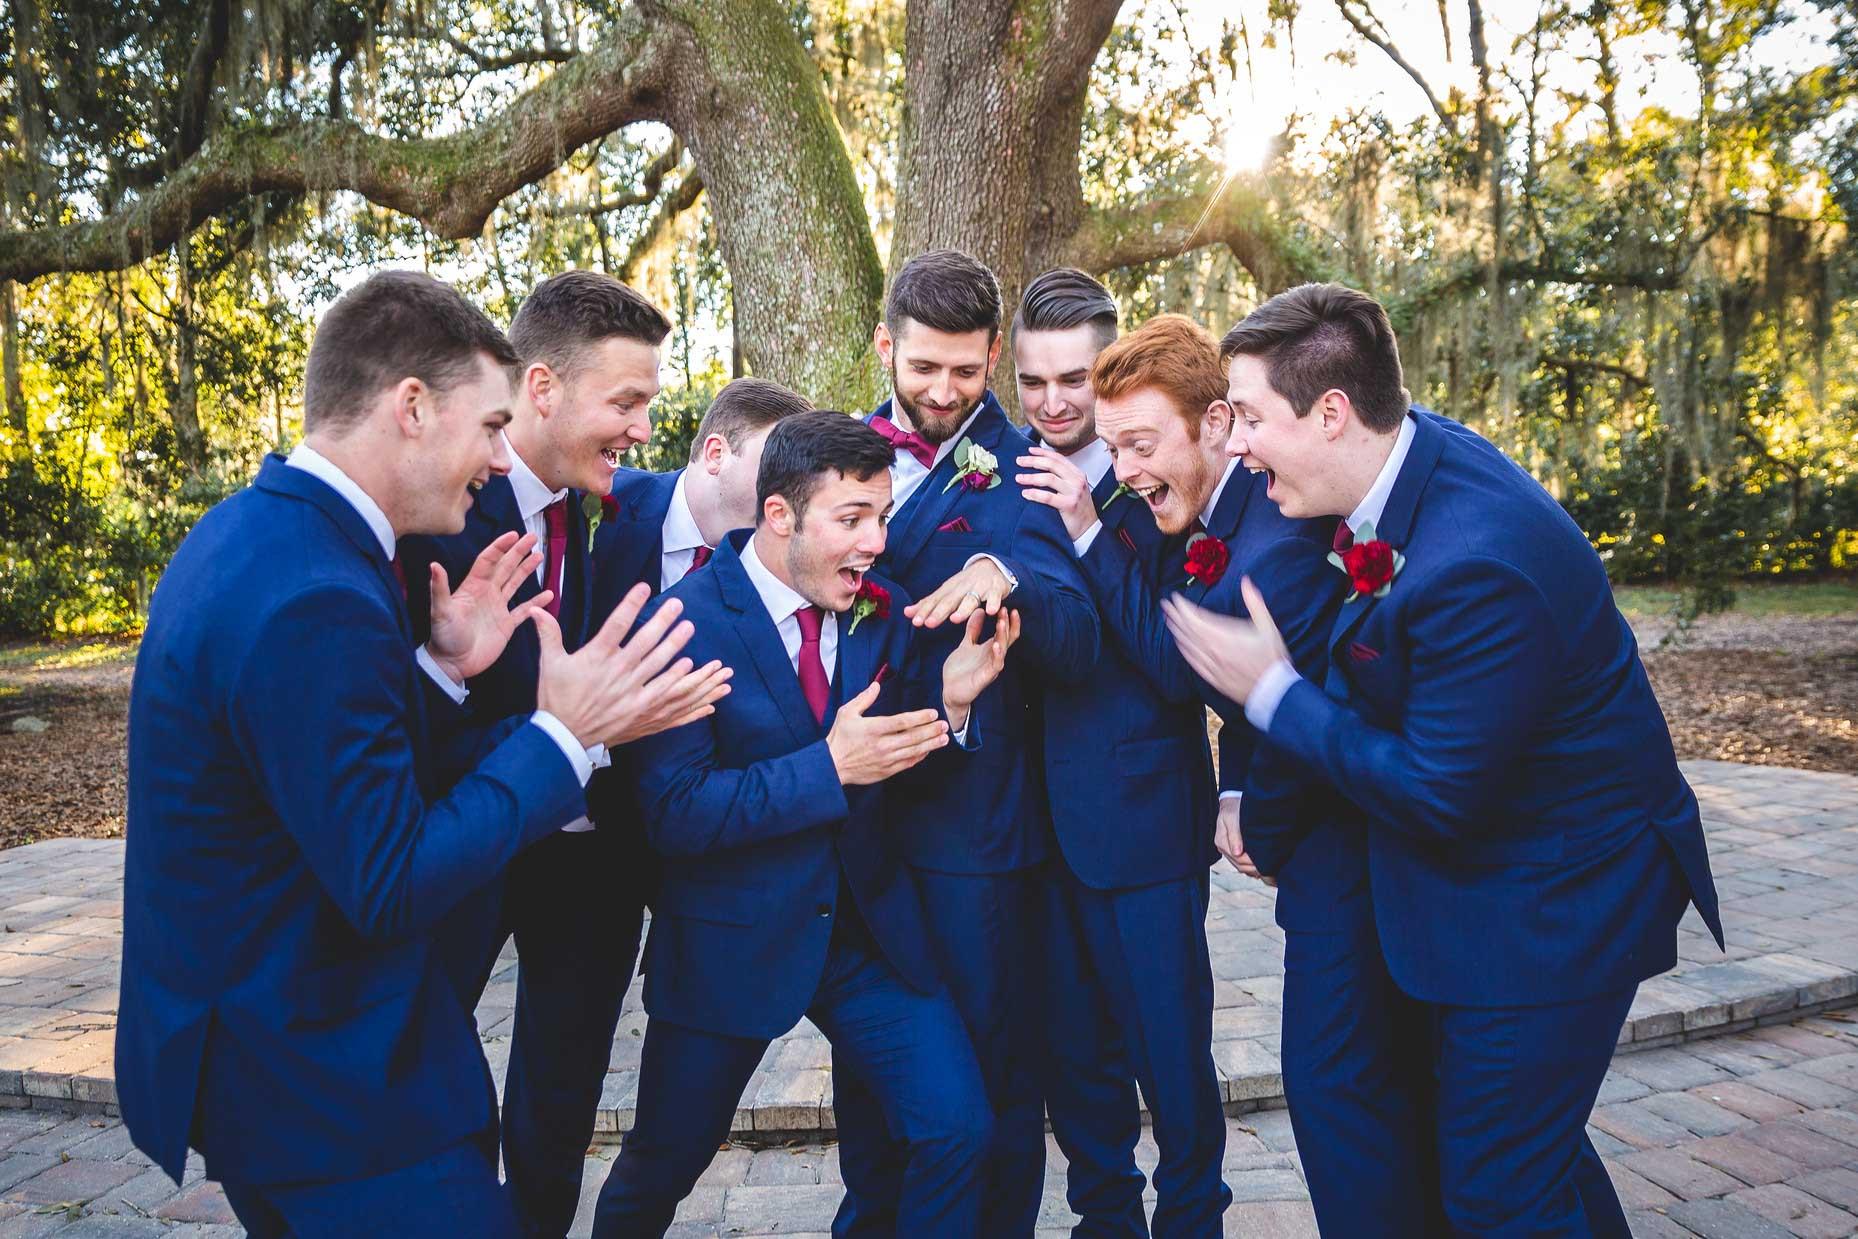 adam-szarmack-bowing-oaks-wedding-photographer-jacksonville-92.jpg